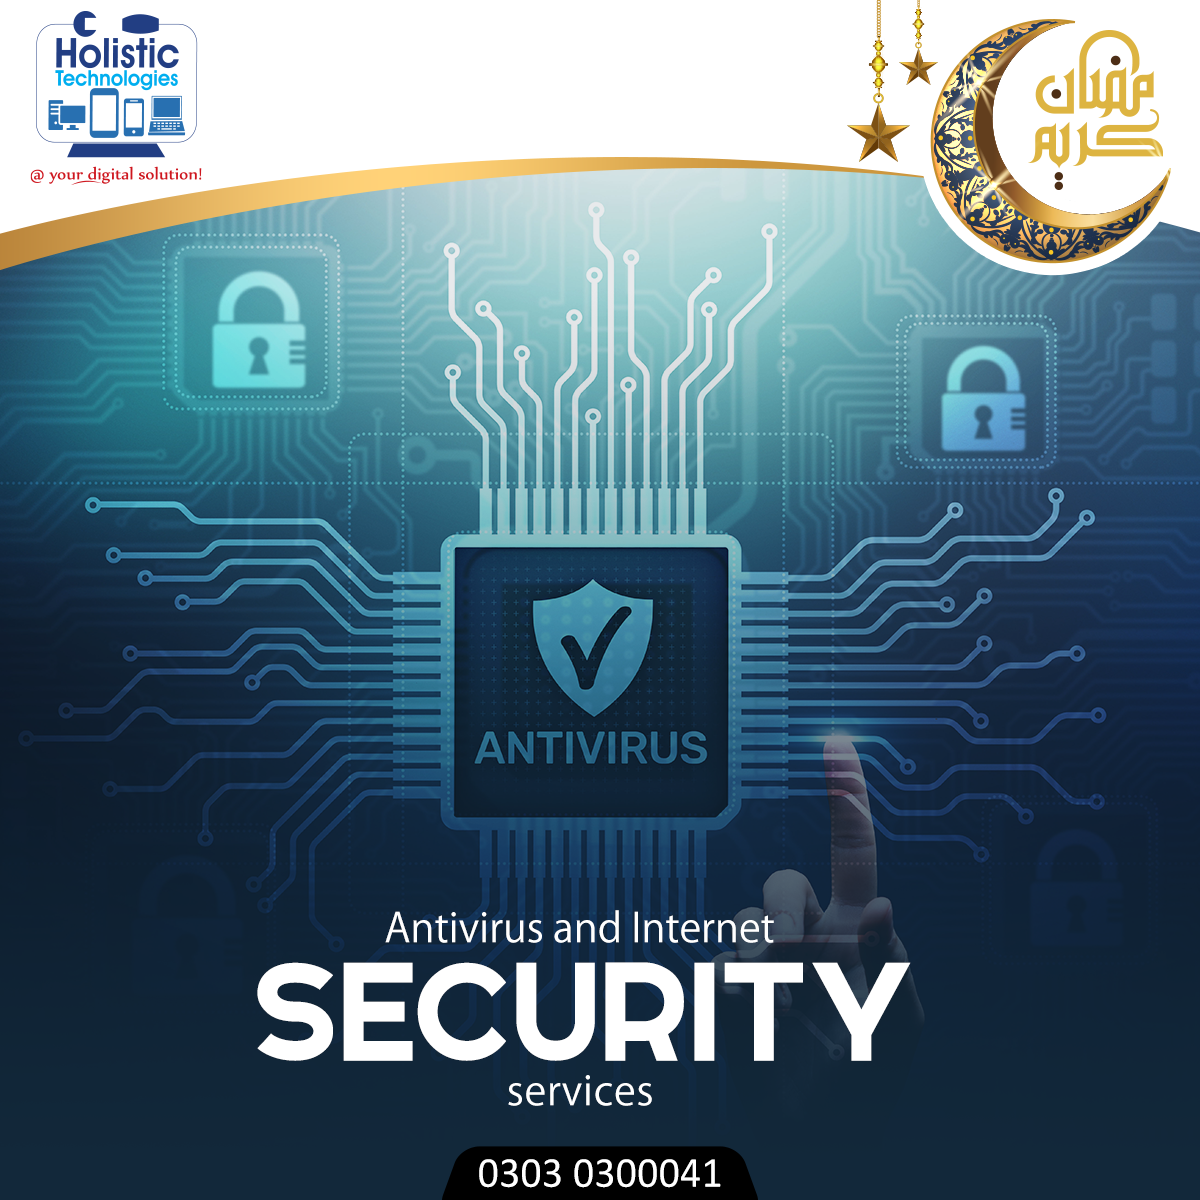 Antivirus Internet Security Internet Security Cyber Security Security Service